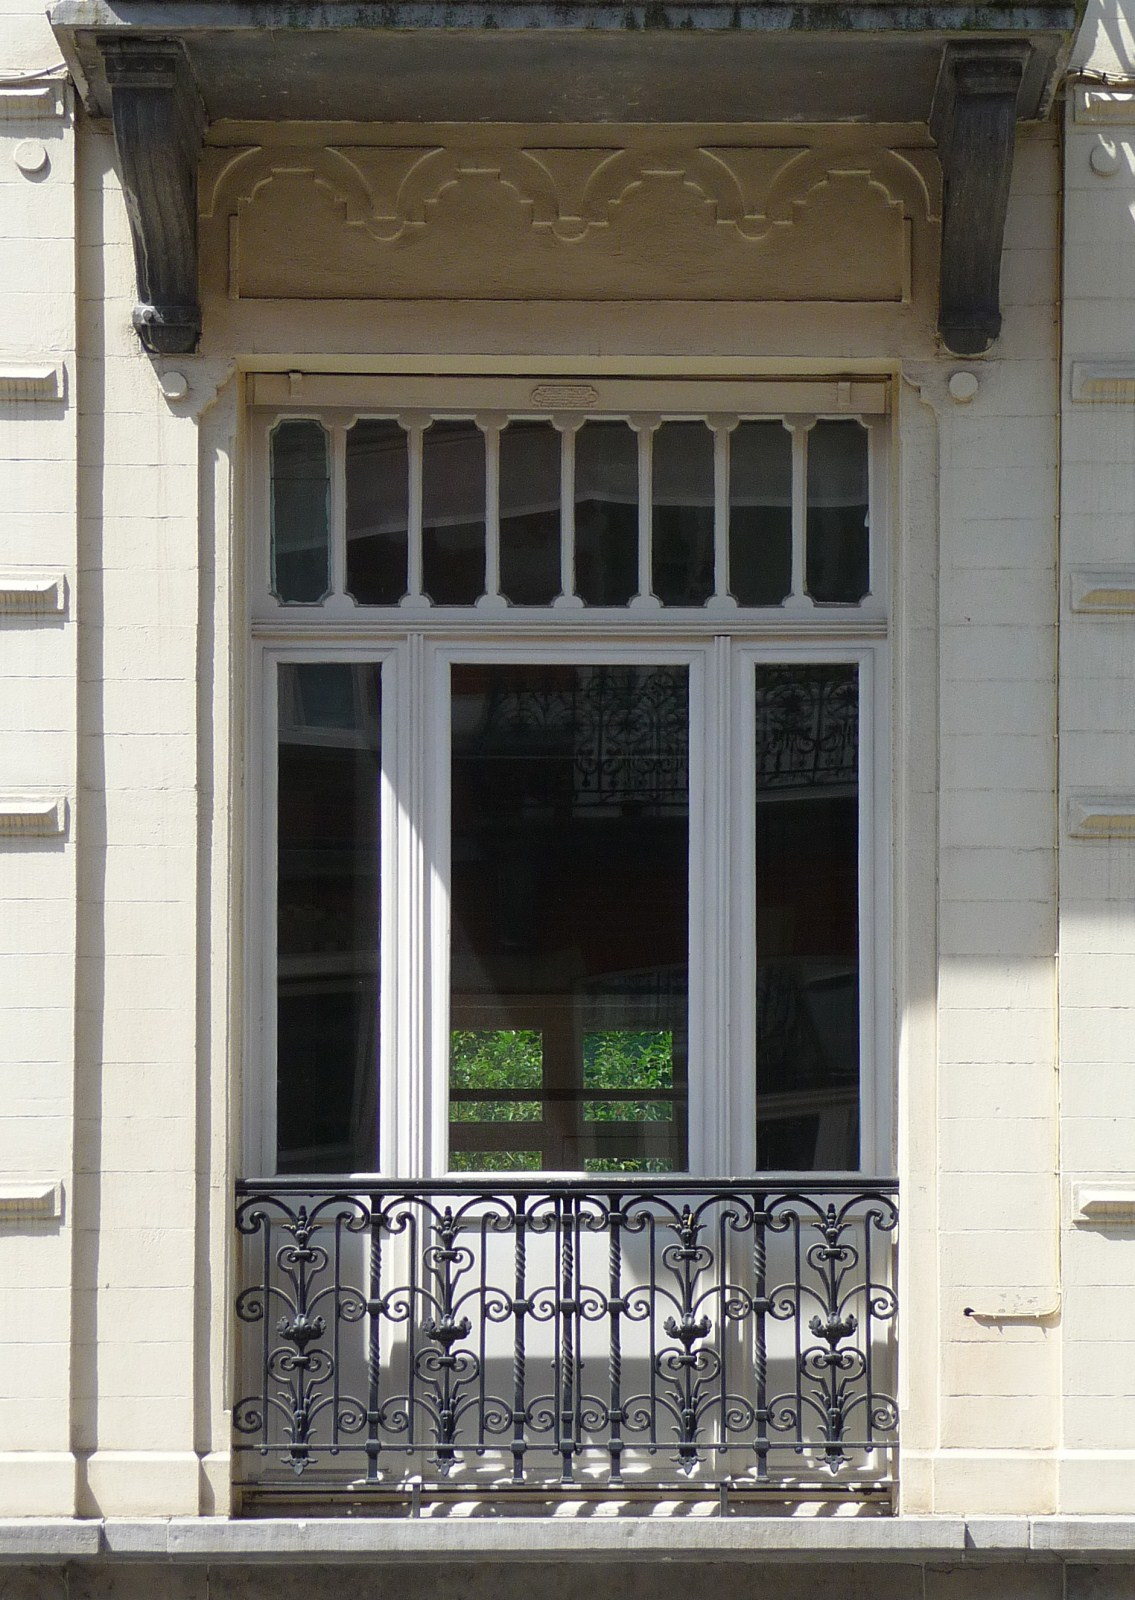 bruxelles extension est rue murillo 54. Black Bedroom Furniture Sets. Home Design Ideas